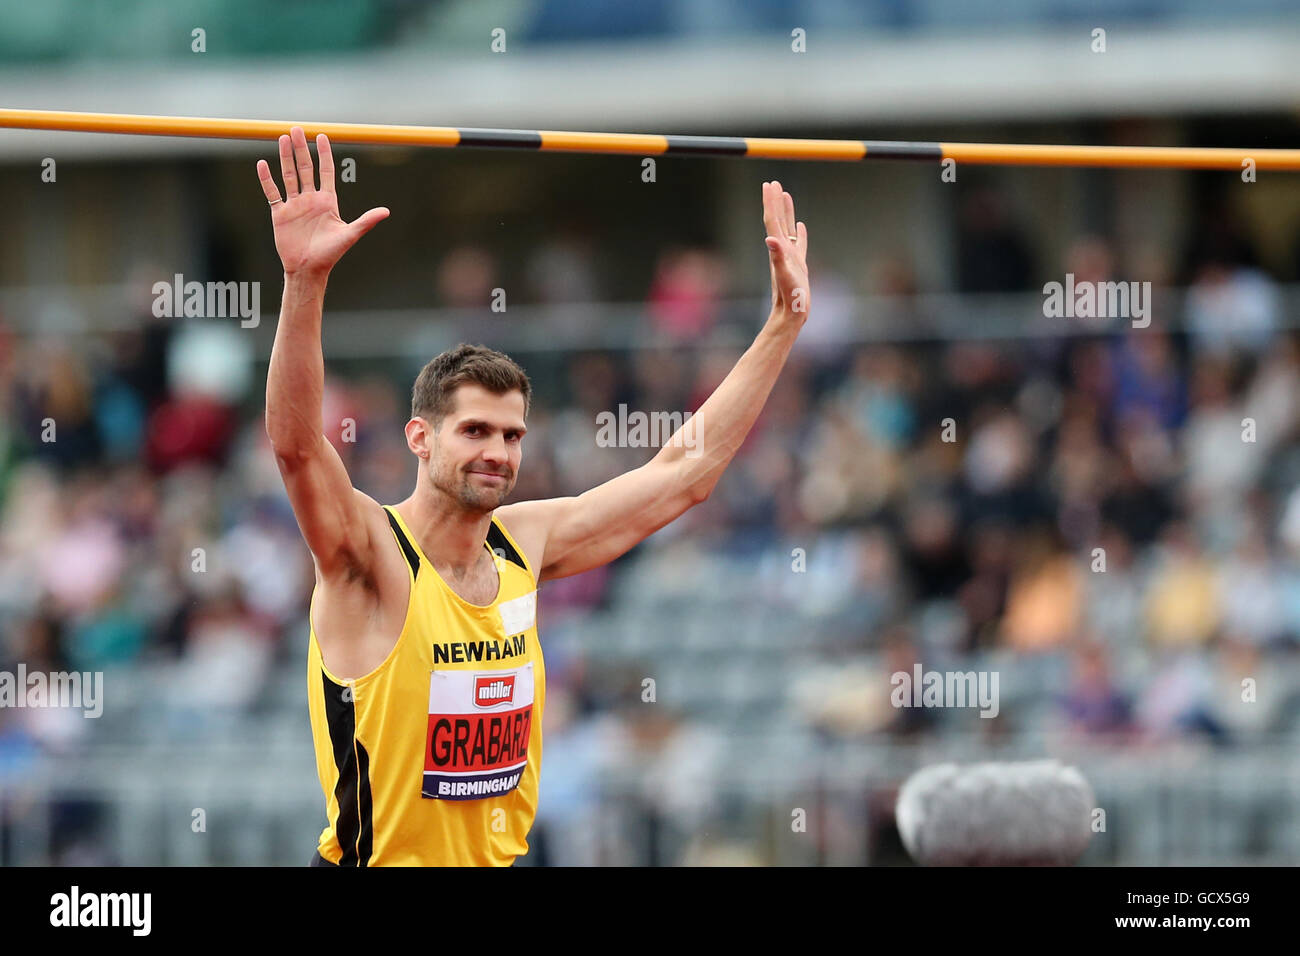 Robbie GRABARZ Men's High Jump Final, 2016 British Championships; Birmingham Alexander Stadium UK. - Stock Image